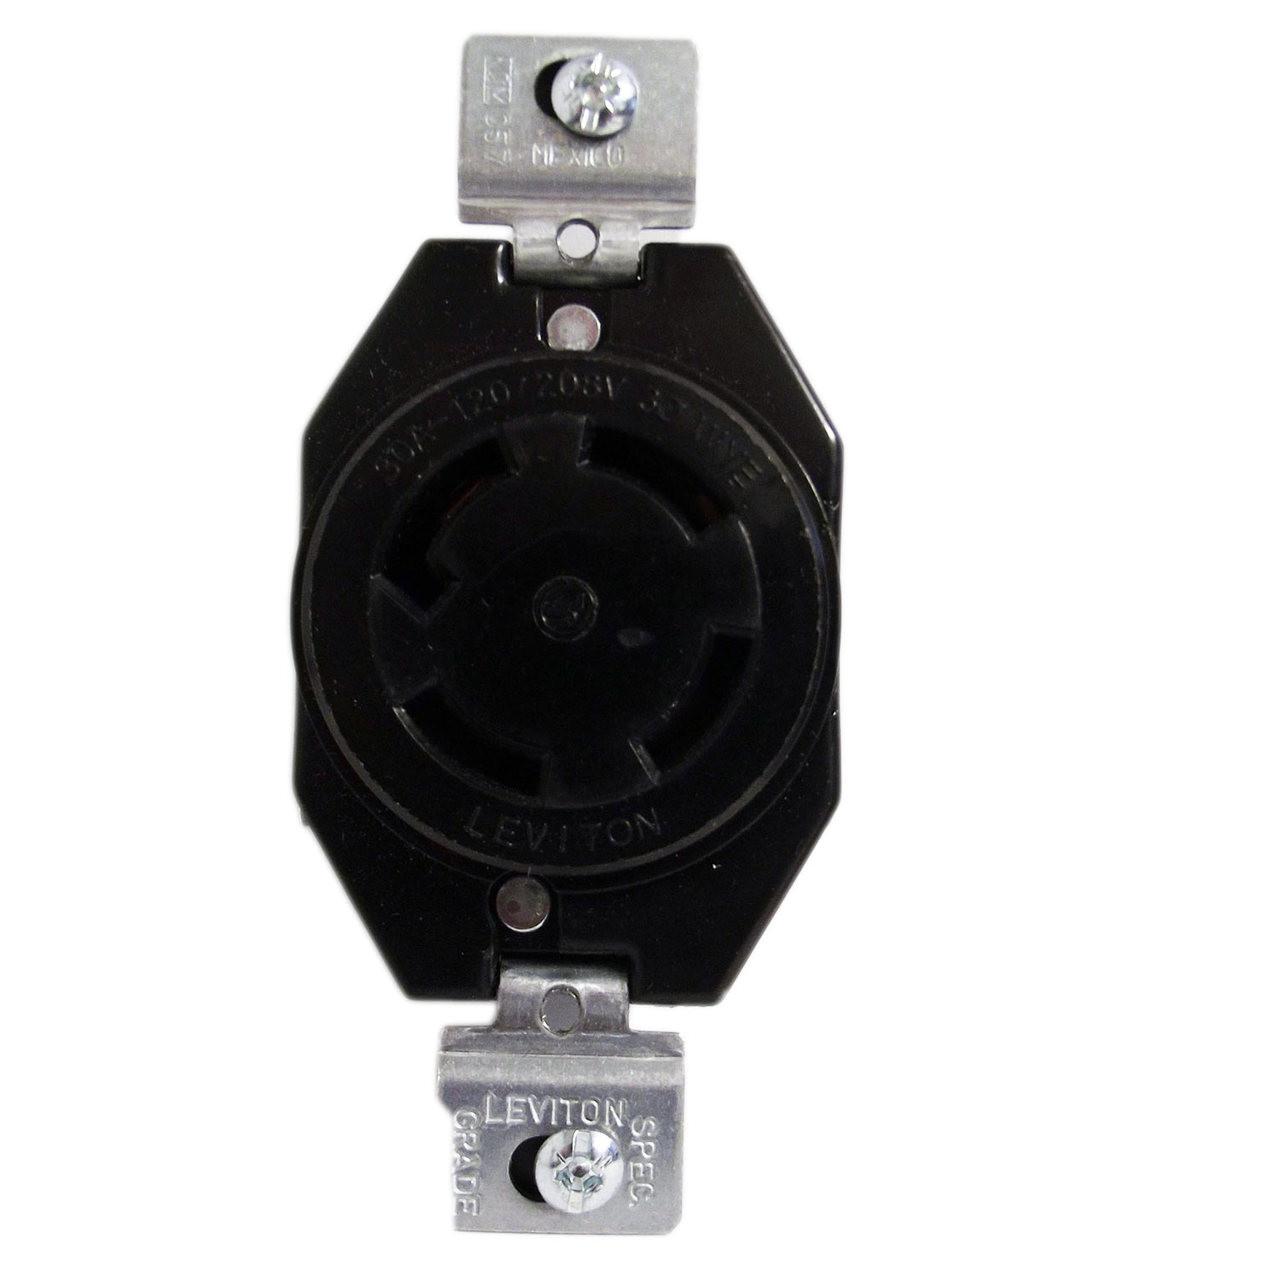 Leviton 3430 Flush Mounting Locking Receptacle